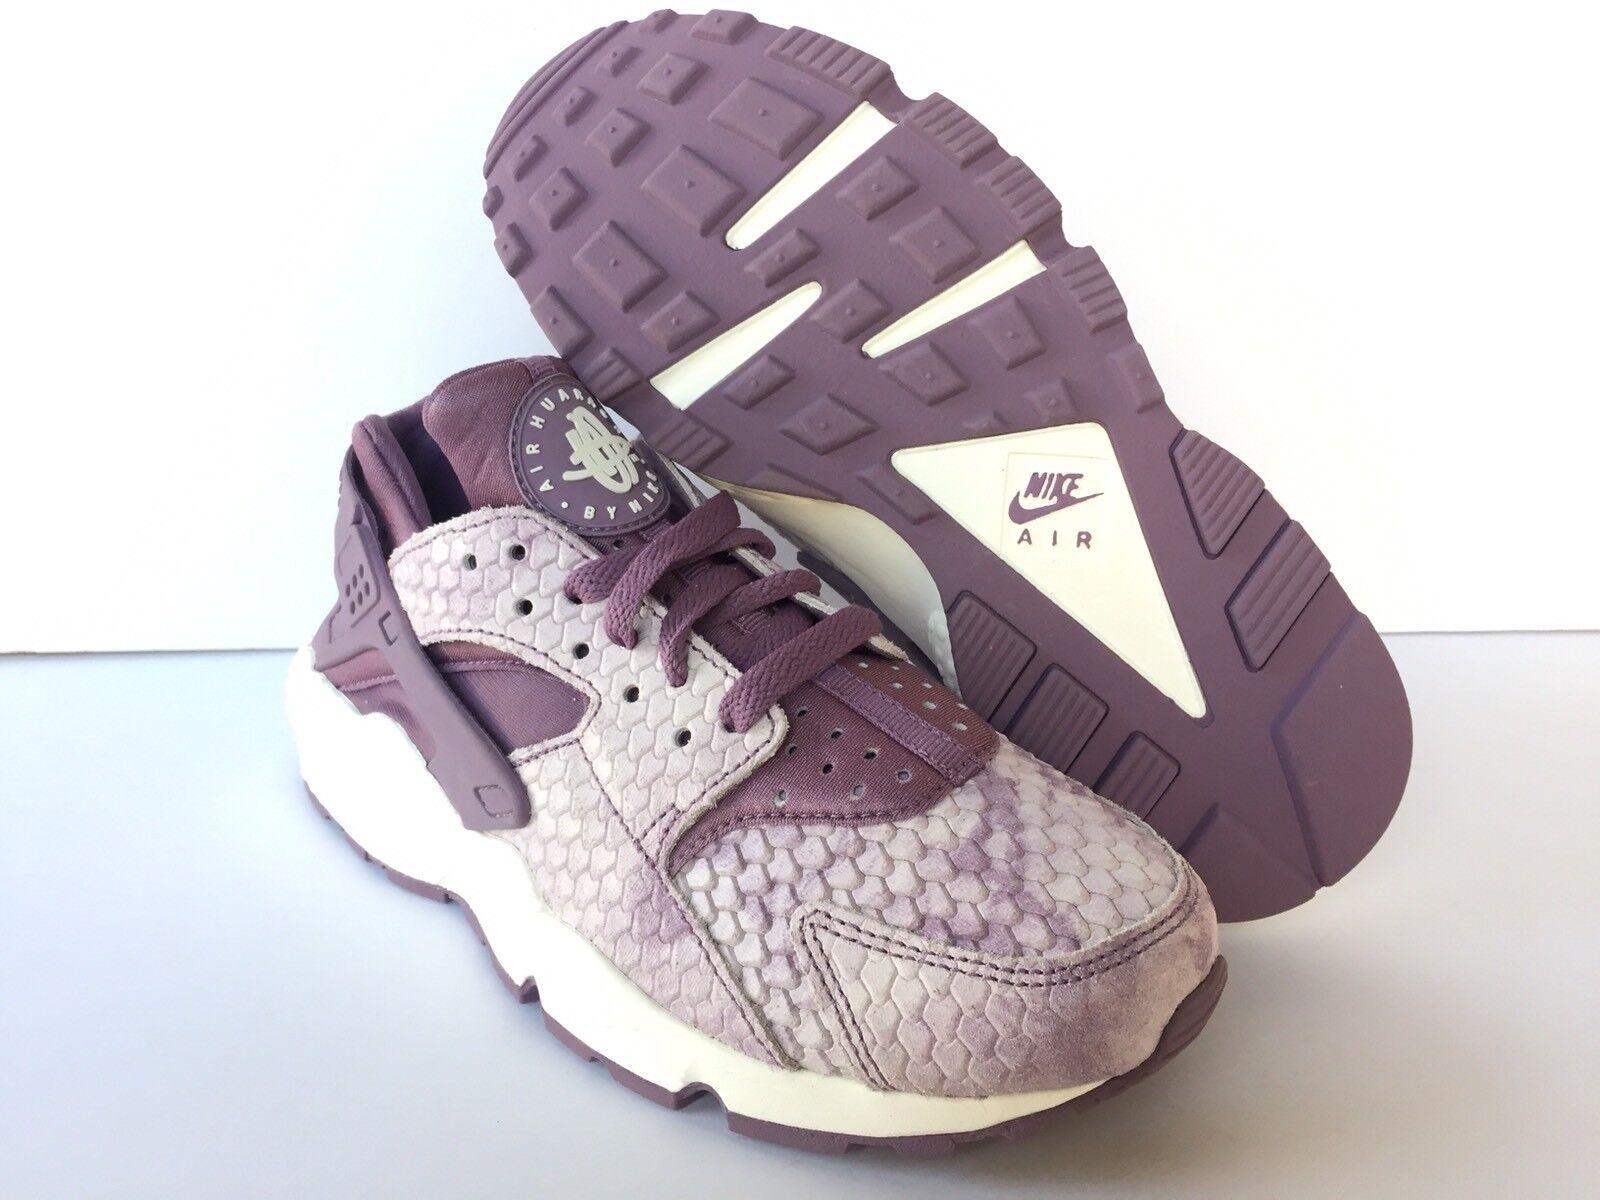 Nike air huarache campione noi wmns sz 7 [683818-500. violet polvere